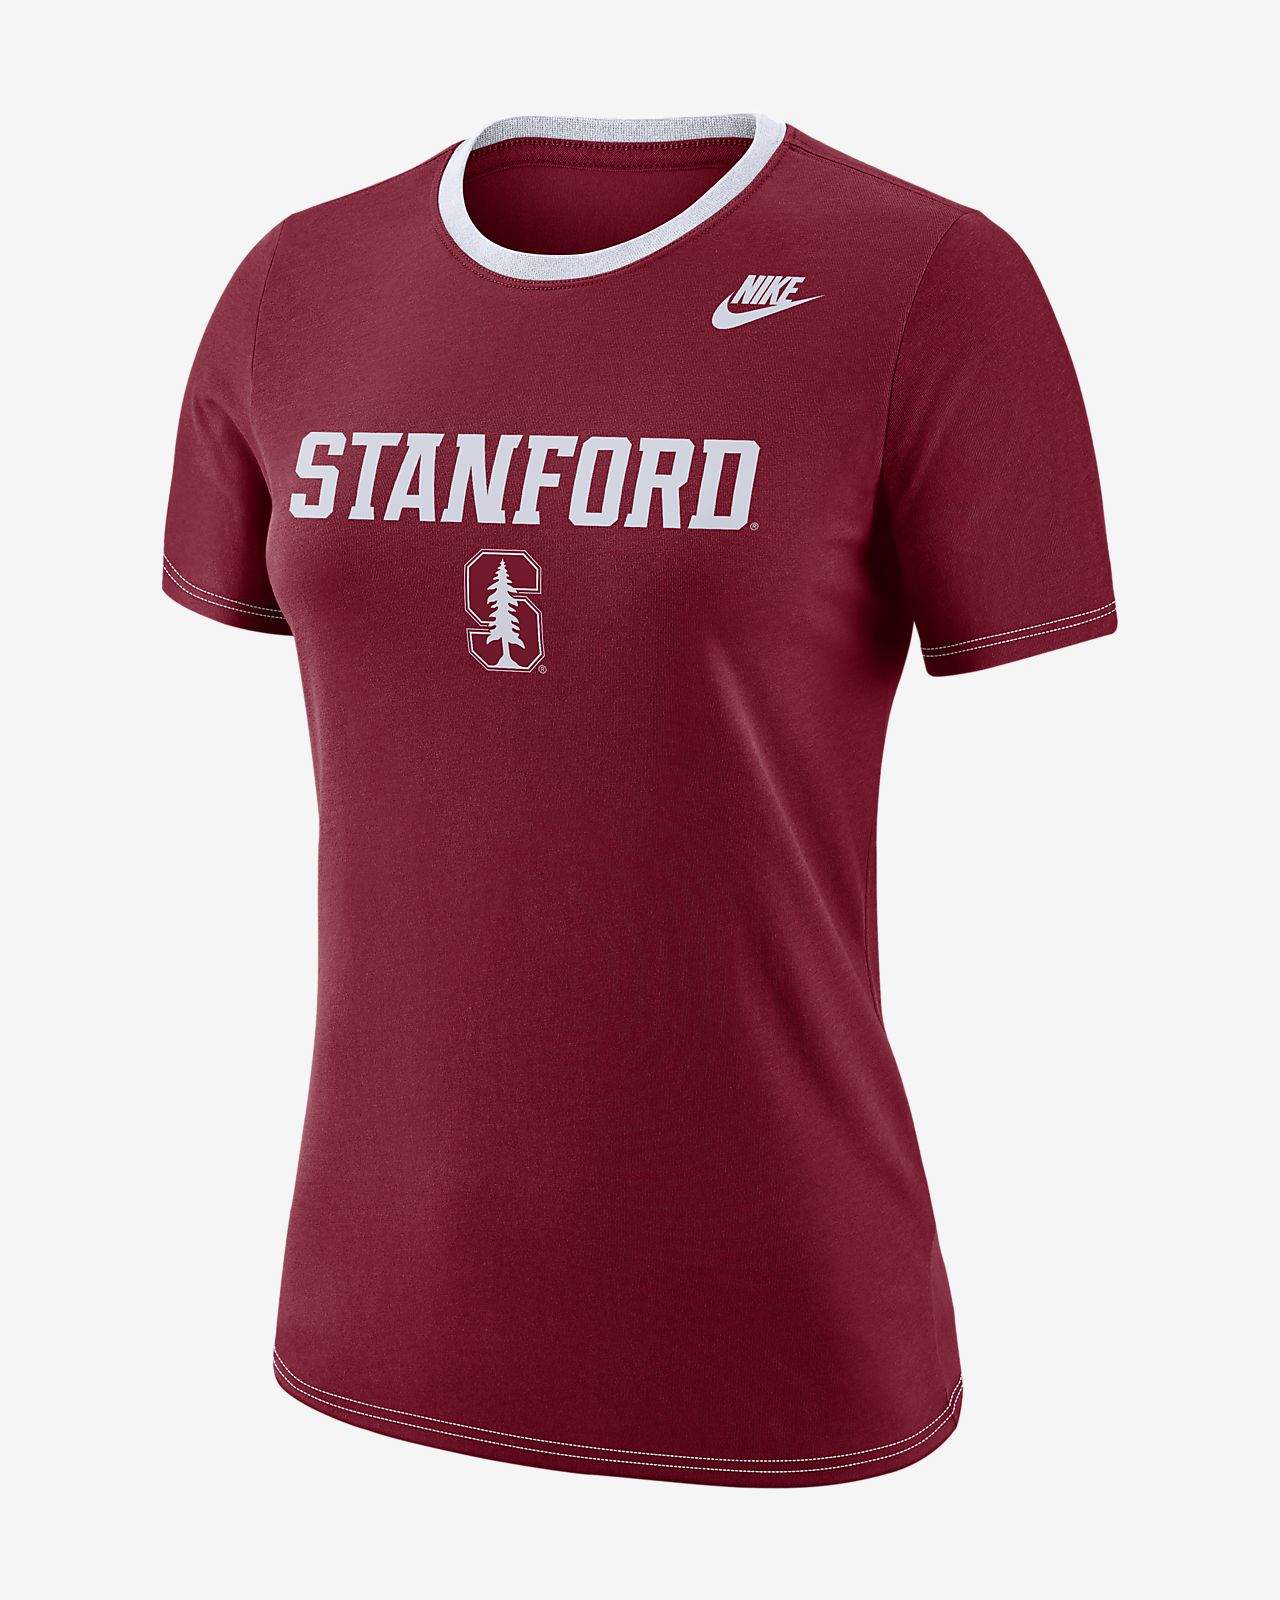 Nike College Dri-FIT (Stanford) Women's T-Shirt